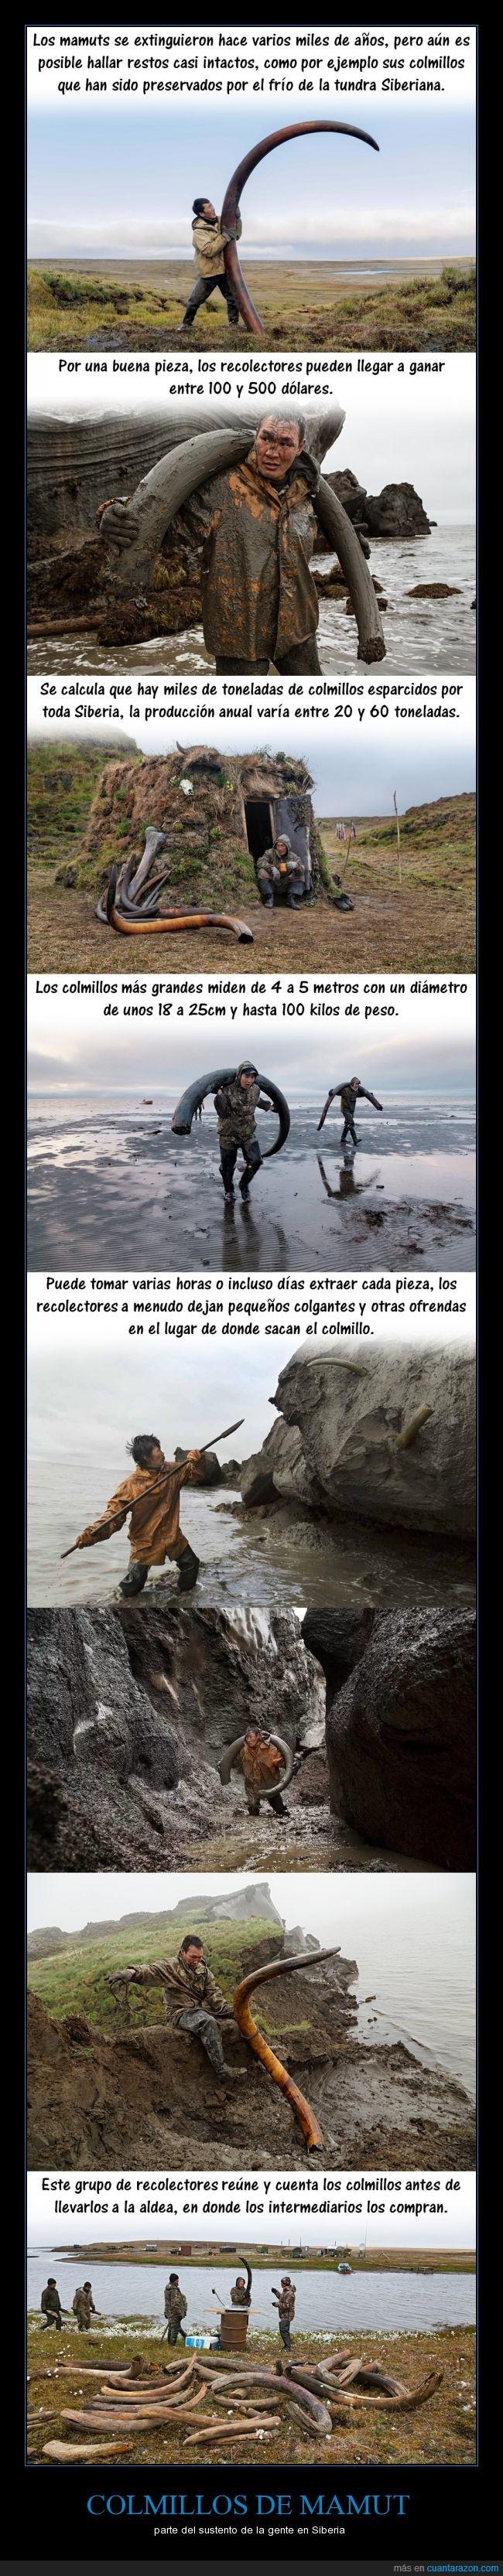 colmillo,fotografía,frío,mamut,marfil,norte,permafrost,Rusia,Sajá,Siberia,tundra